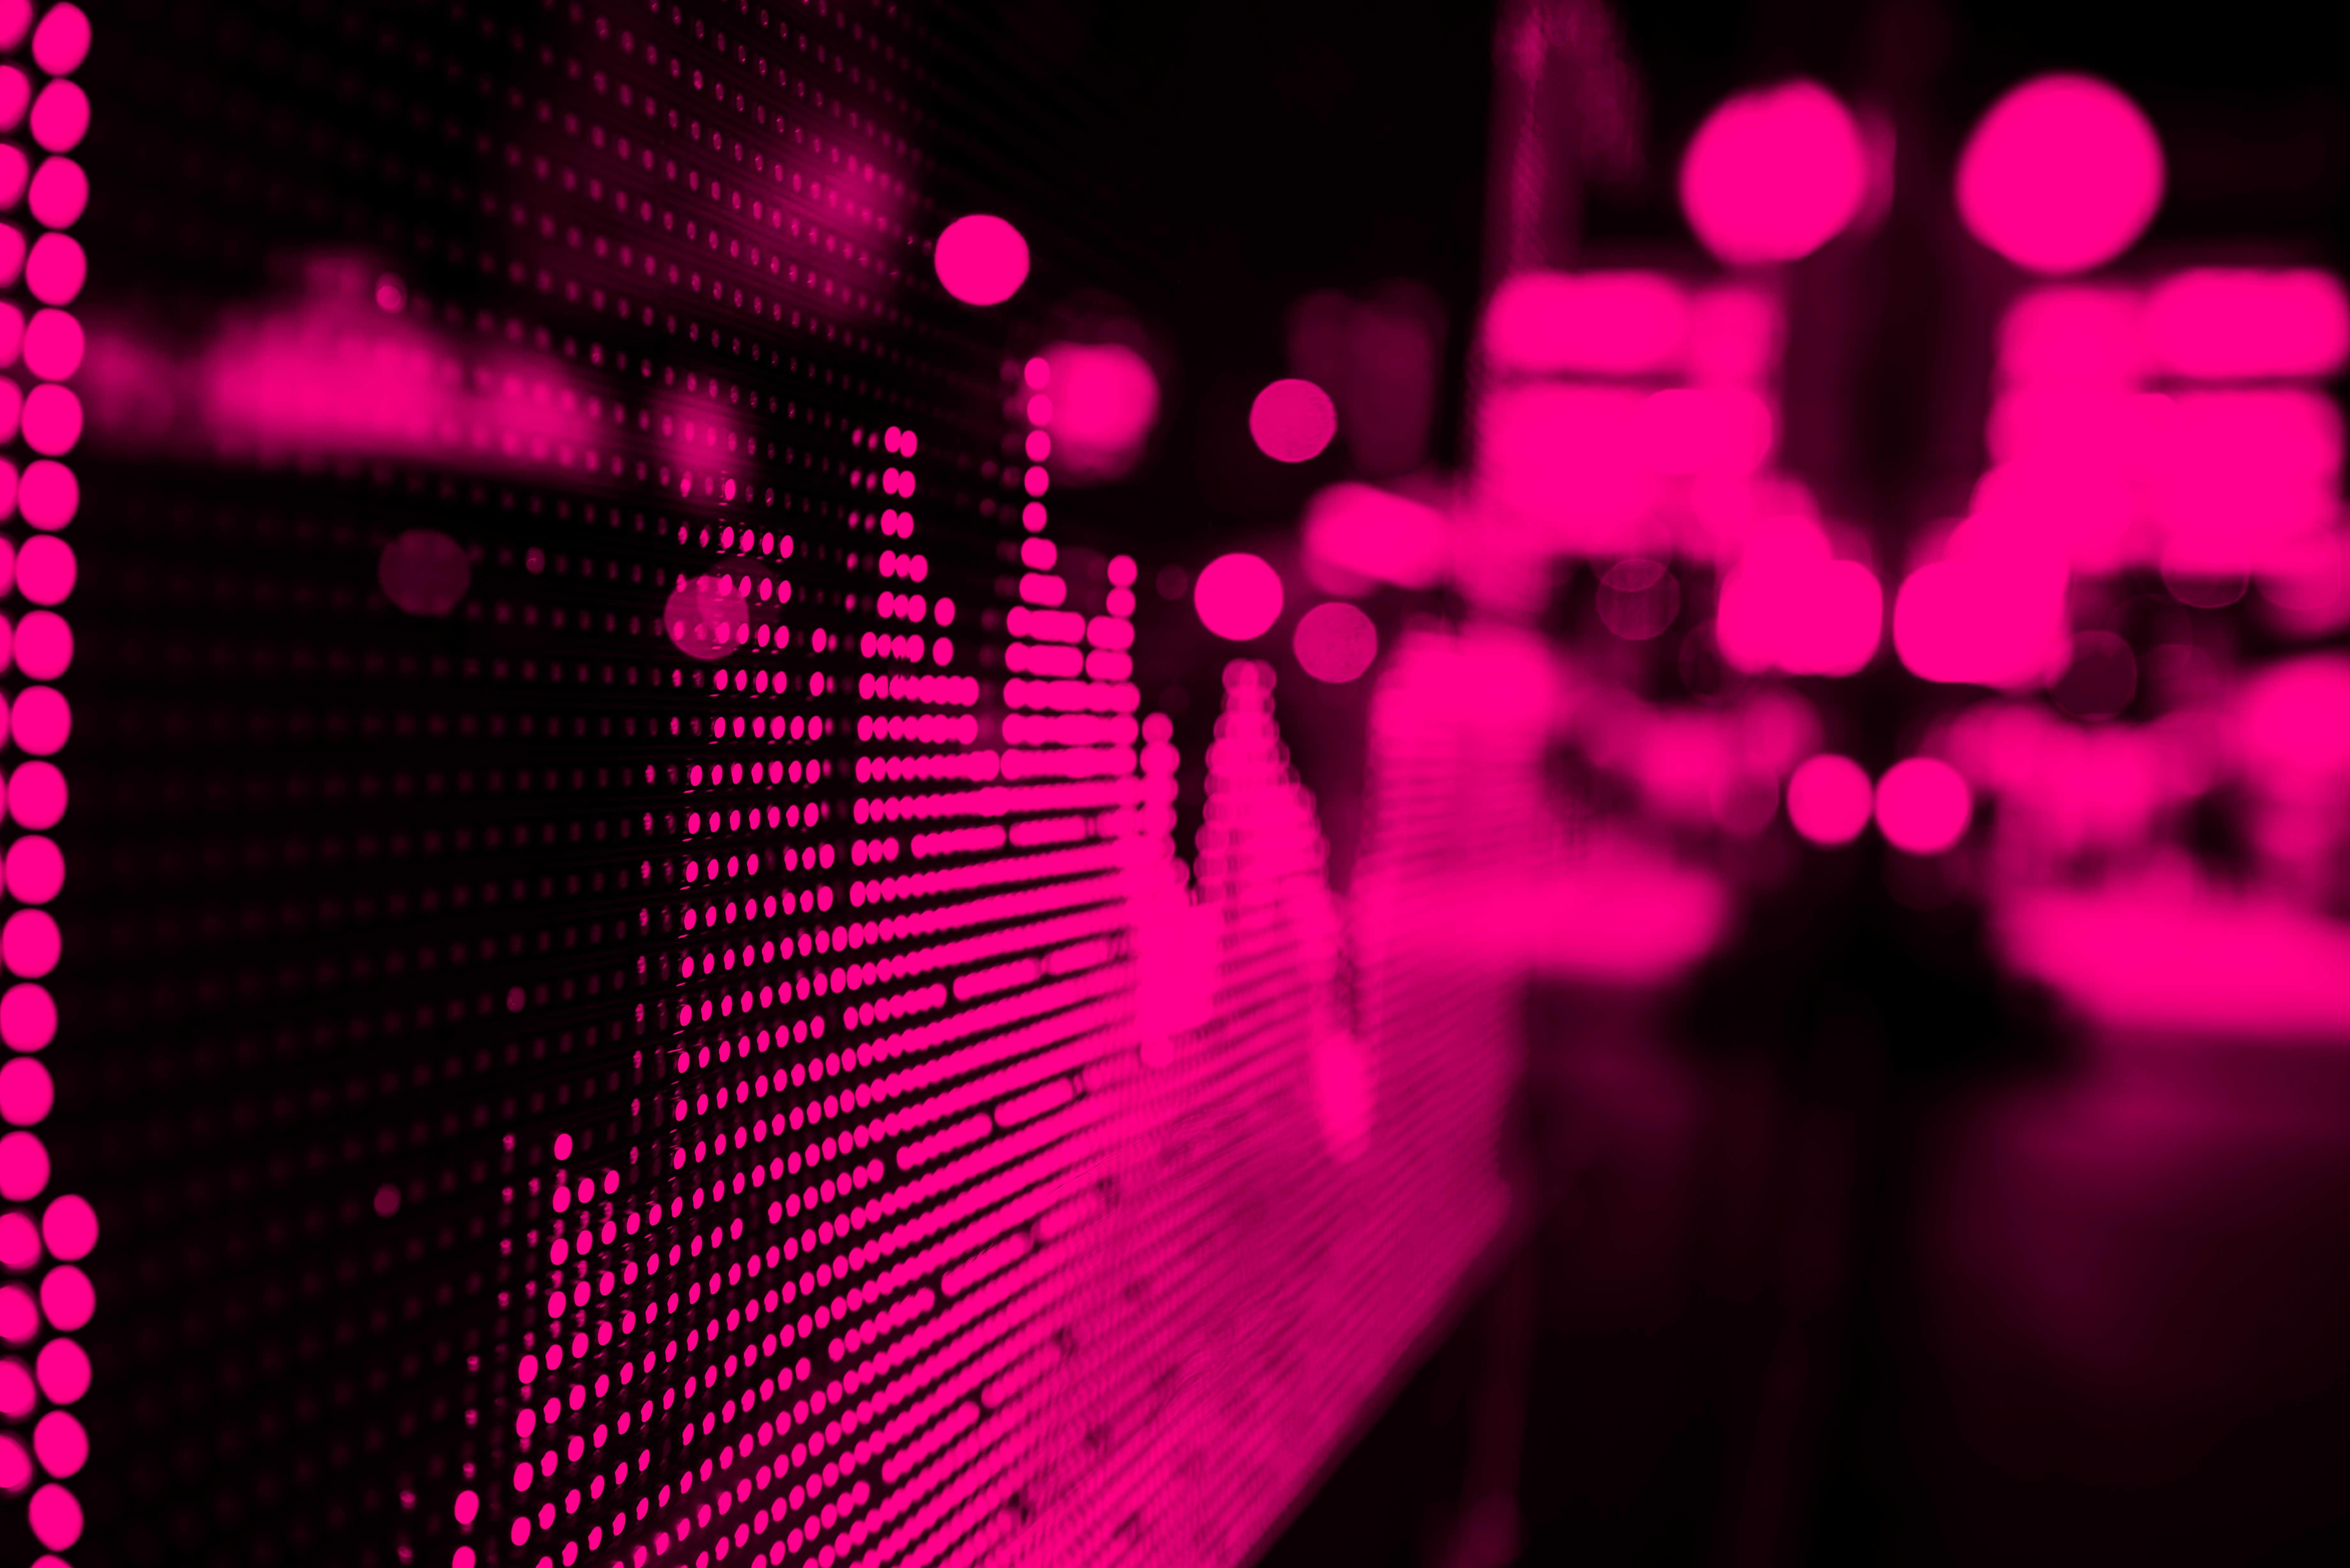 Data_Sign_Lights_Pink.jpg